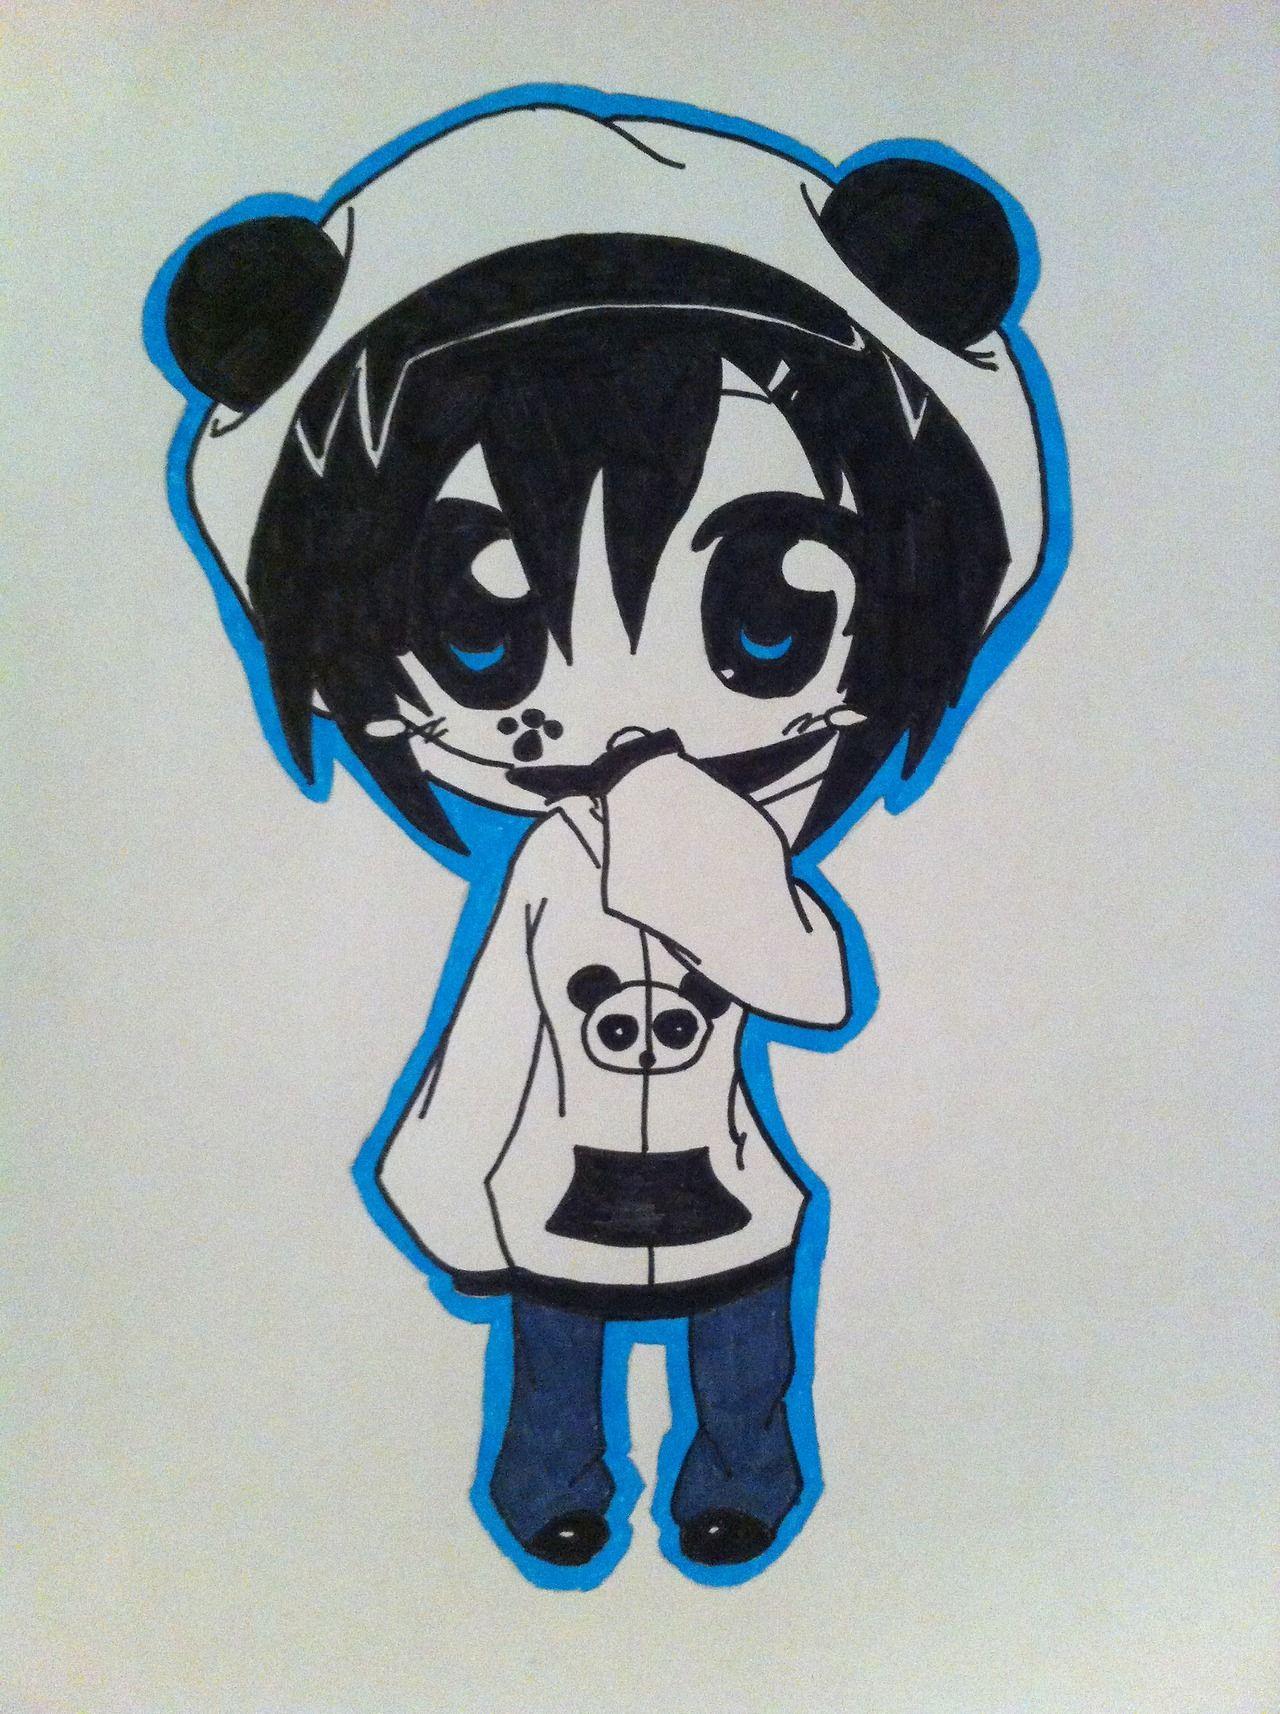 Chibi panda hoodie anime manga otaku vocaloid